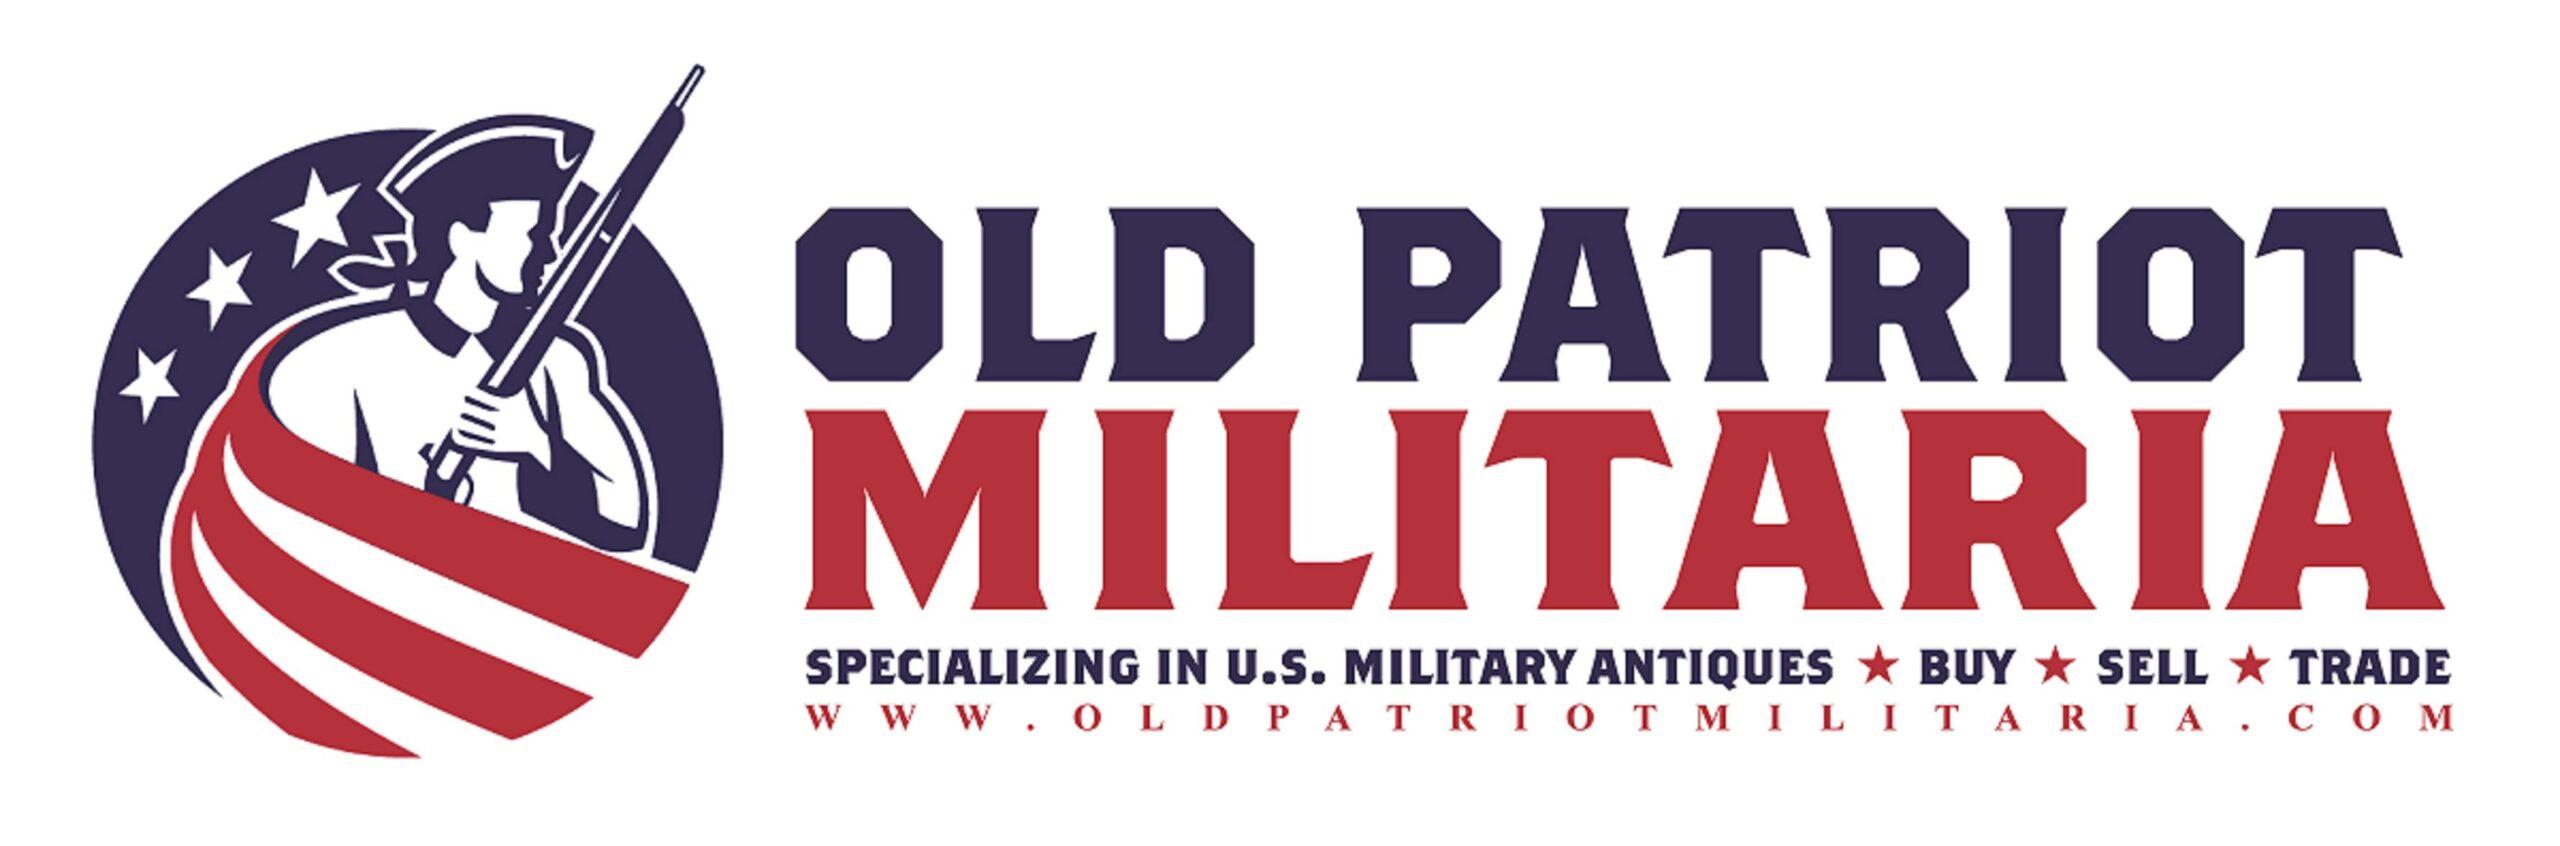 Old Patriot Militaria - Specializing in U.S. Military Antiques